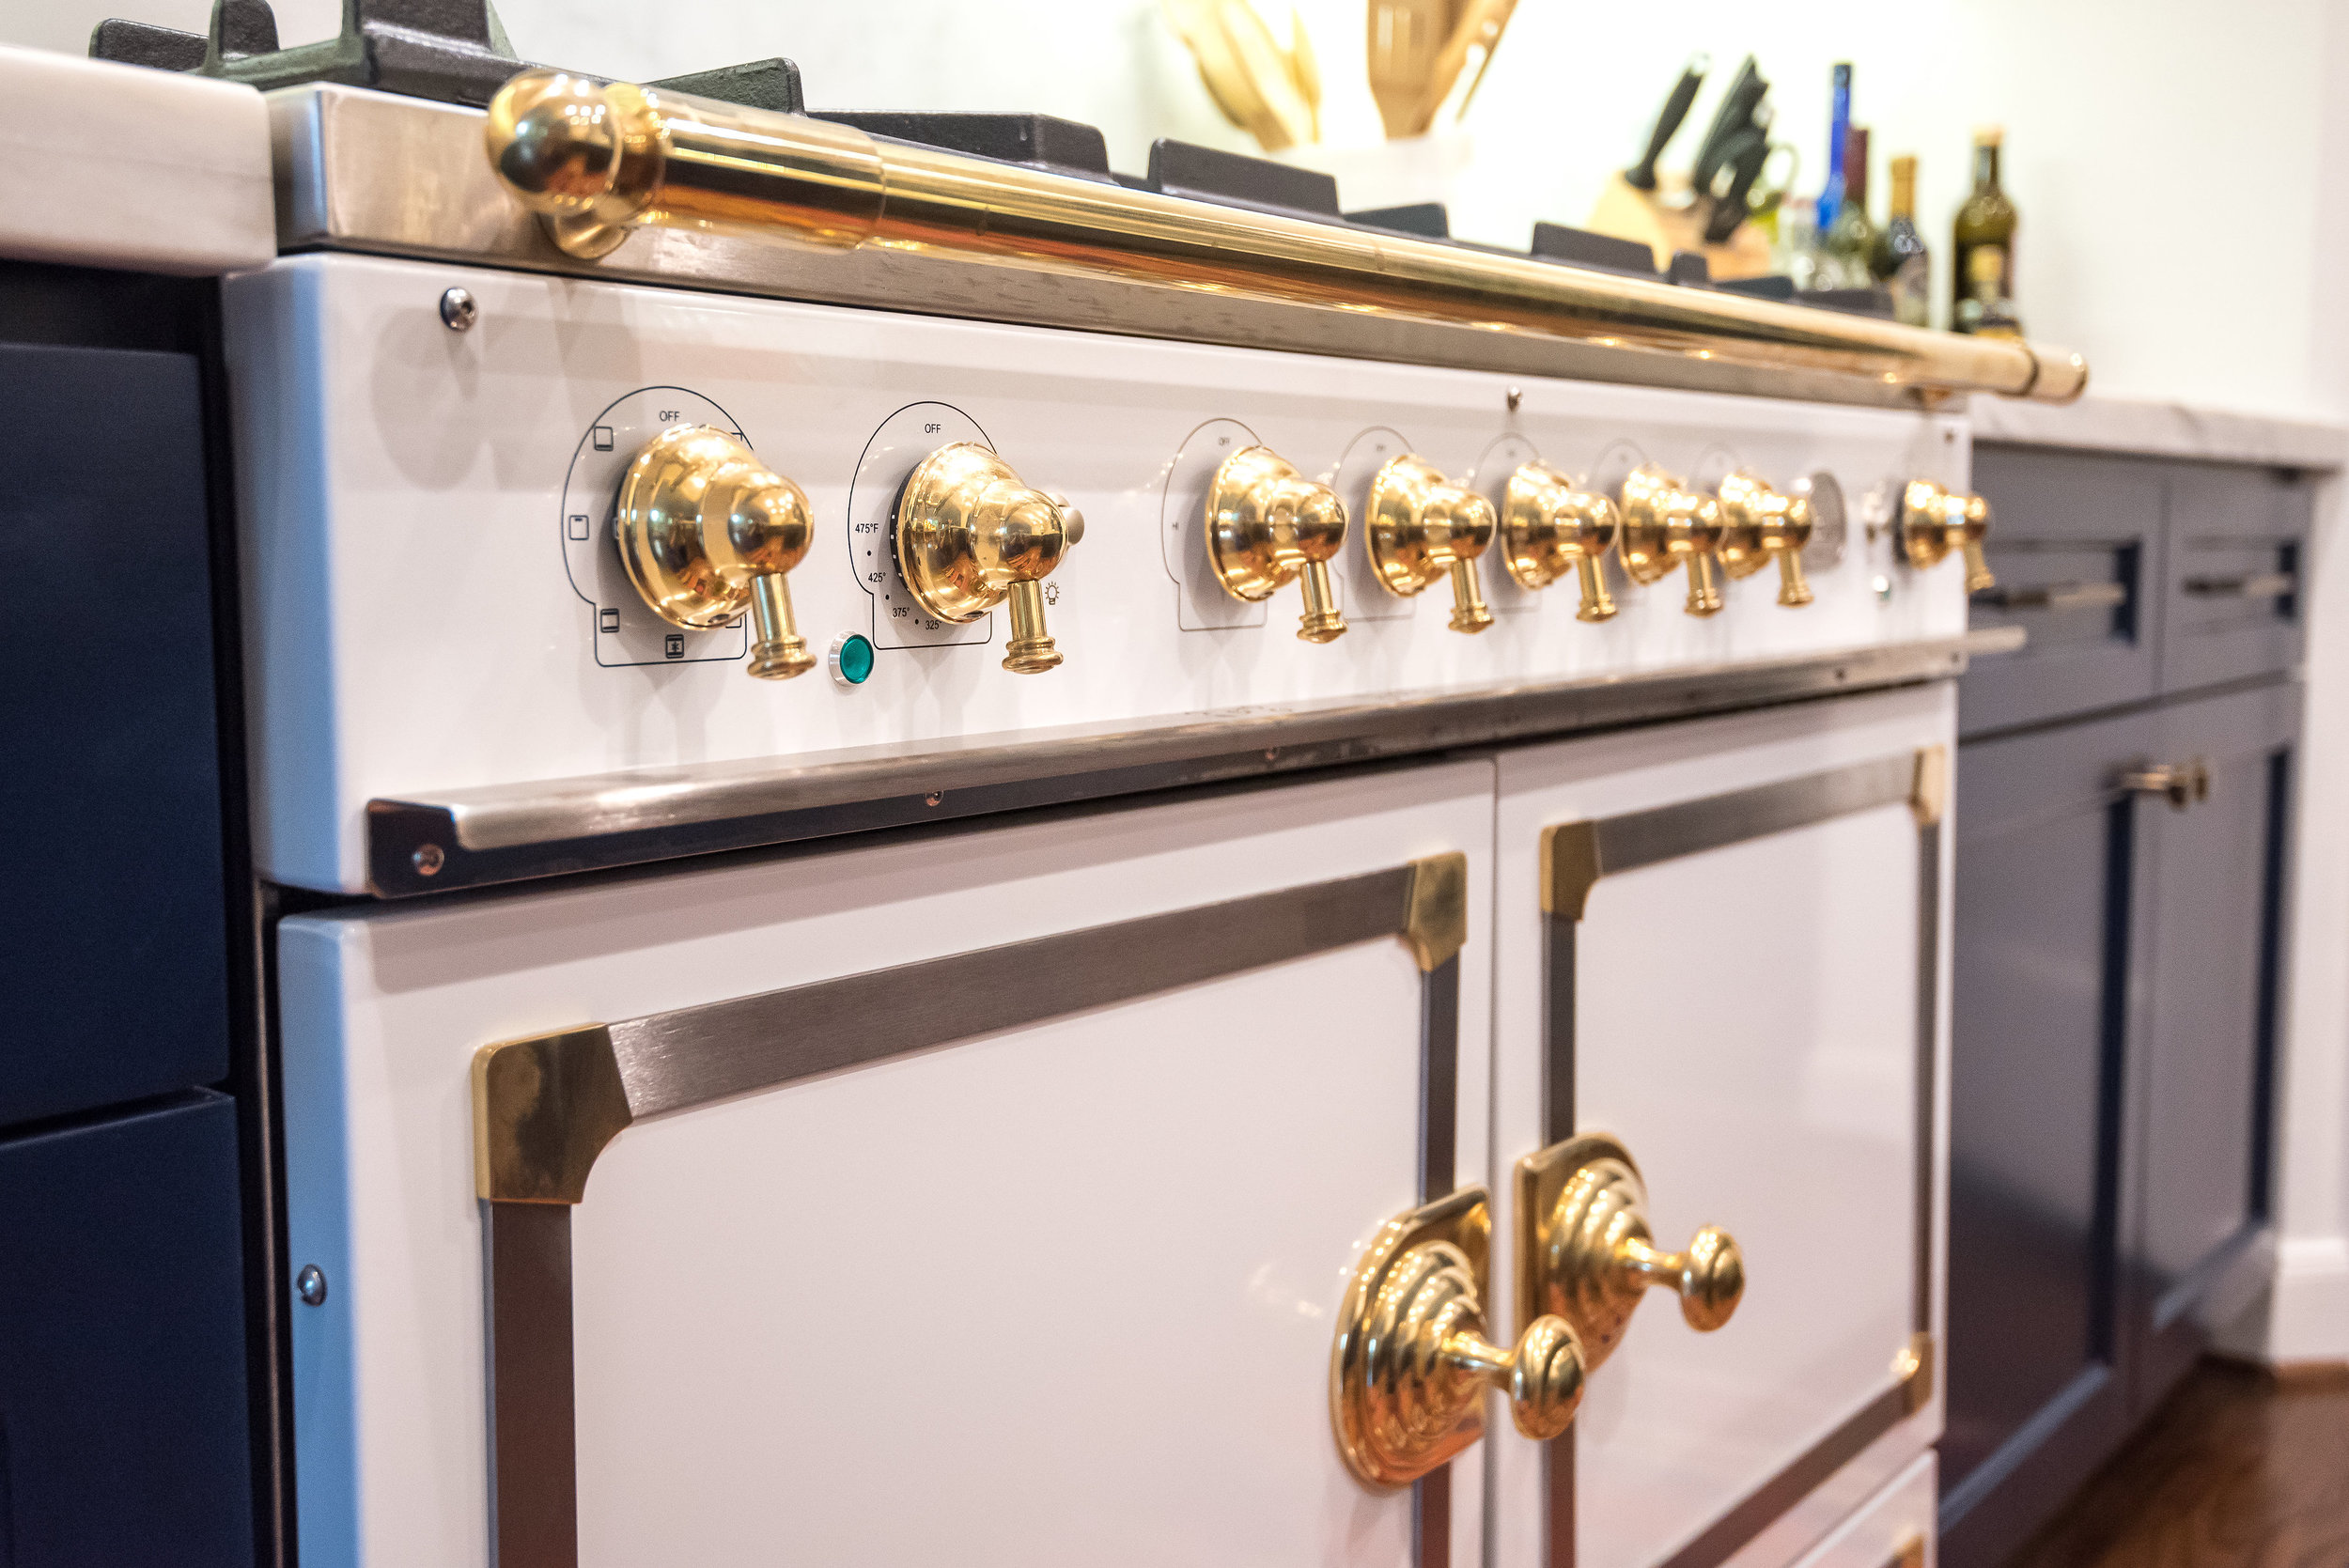 Navy and white kitchen remodel with La Cornue range - Designer Carla Aston